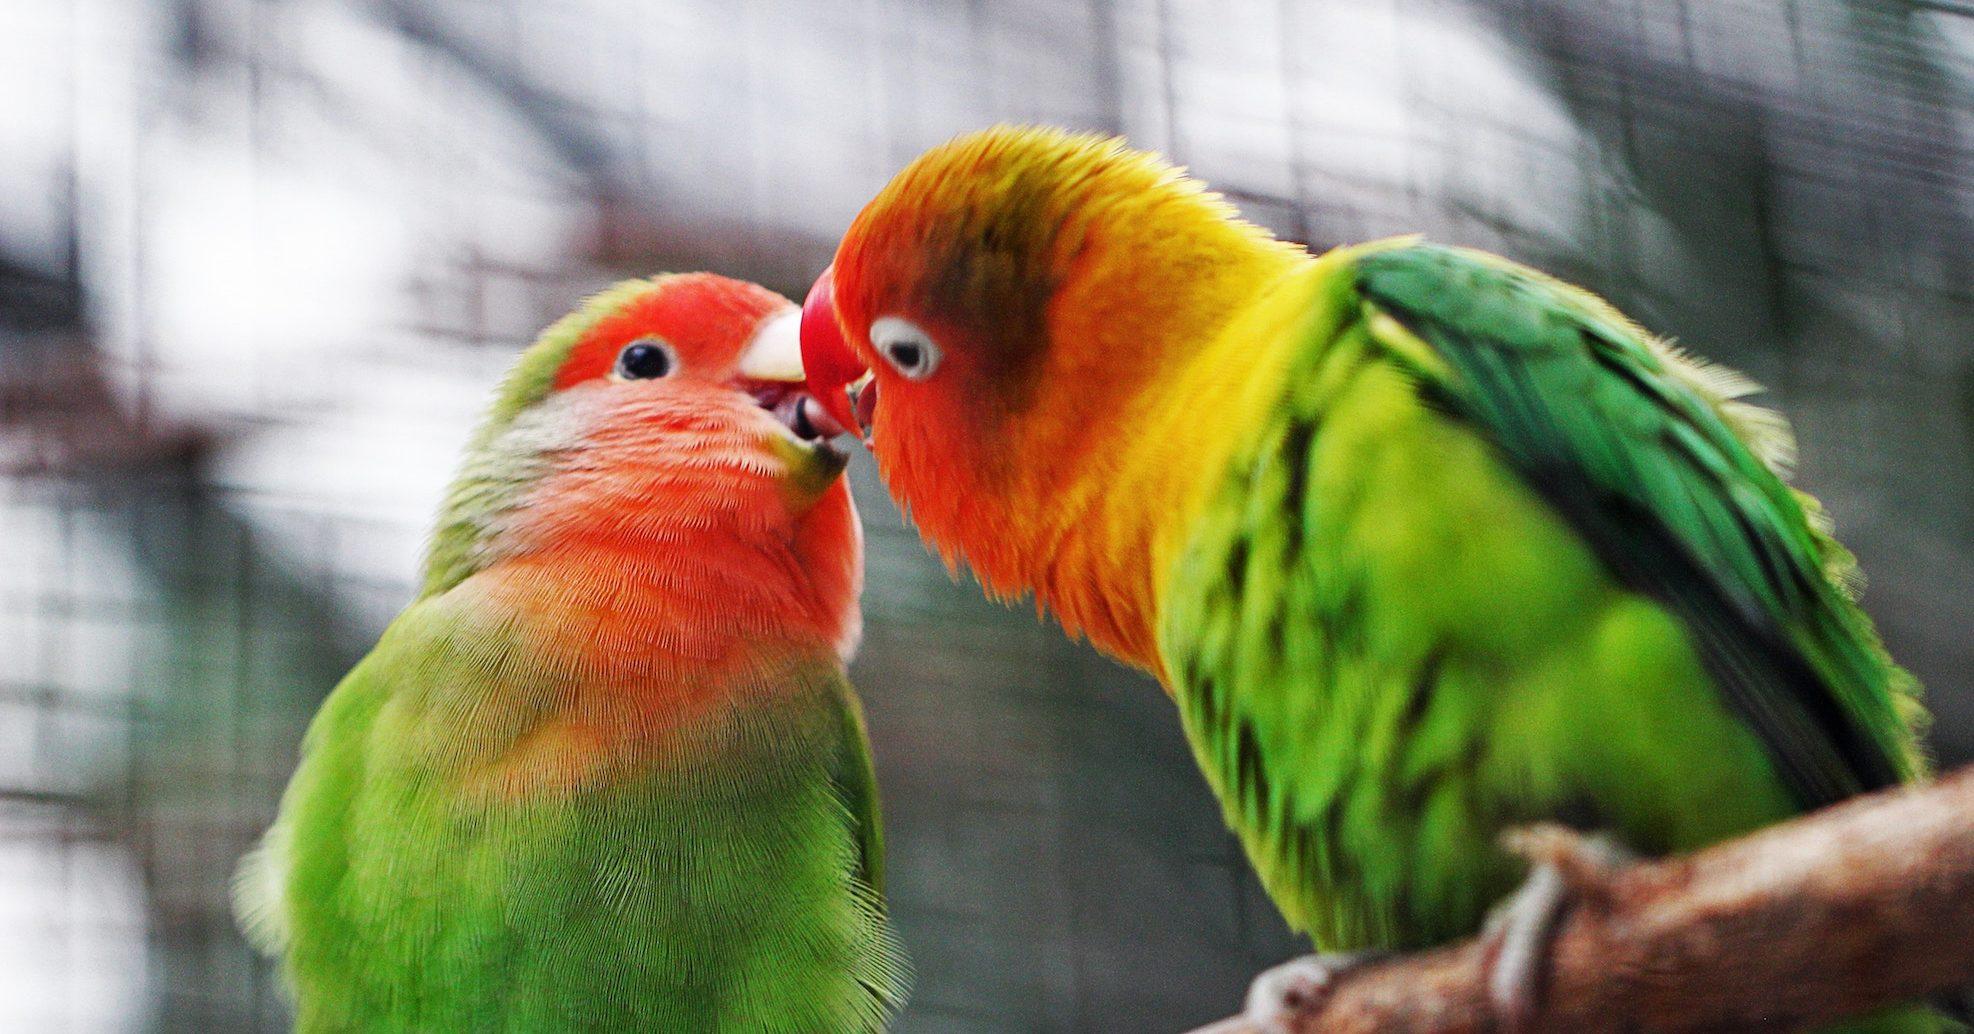 Vogelkuss: Frauen rumkriegen